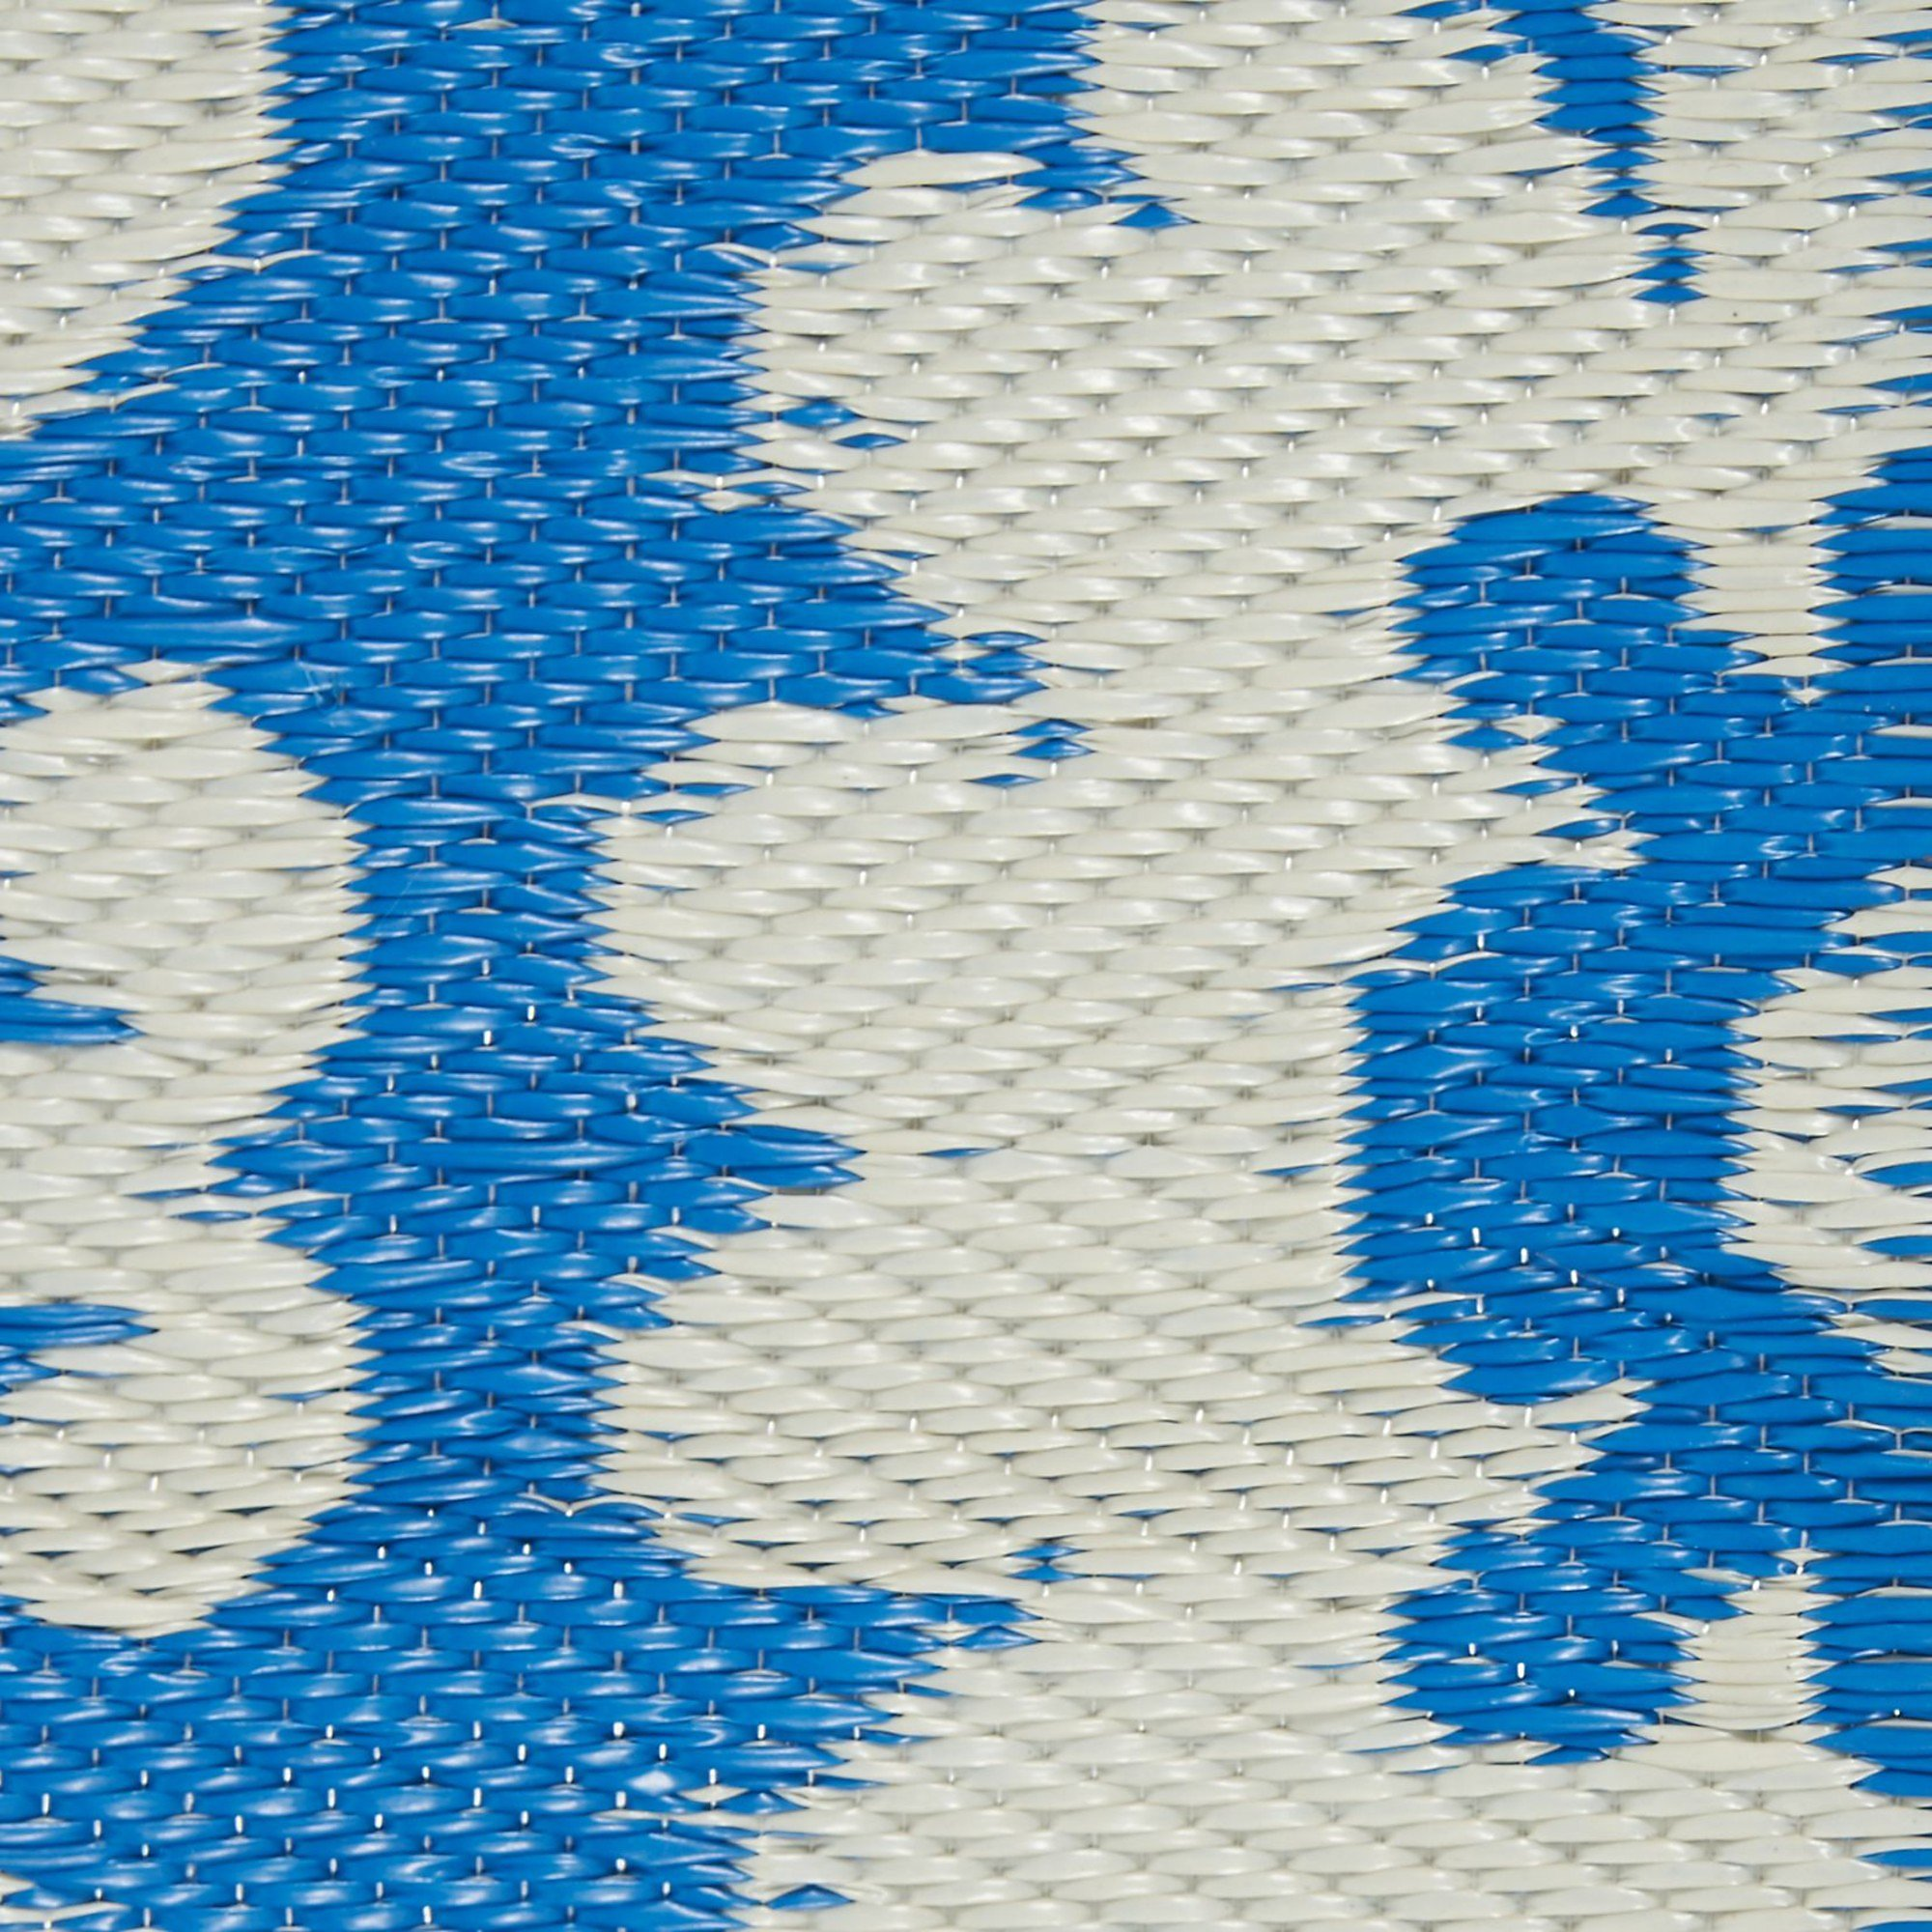 IMPRESSIONEN Living Outdoor Teppich Blau 120 X 180 Cm